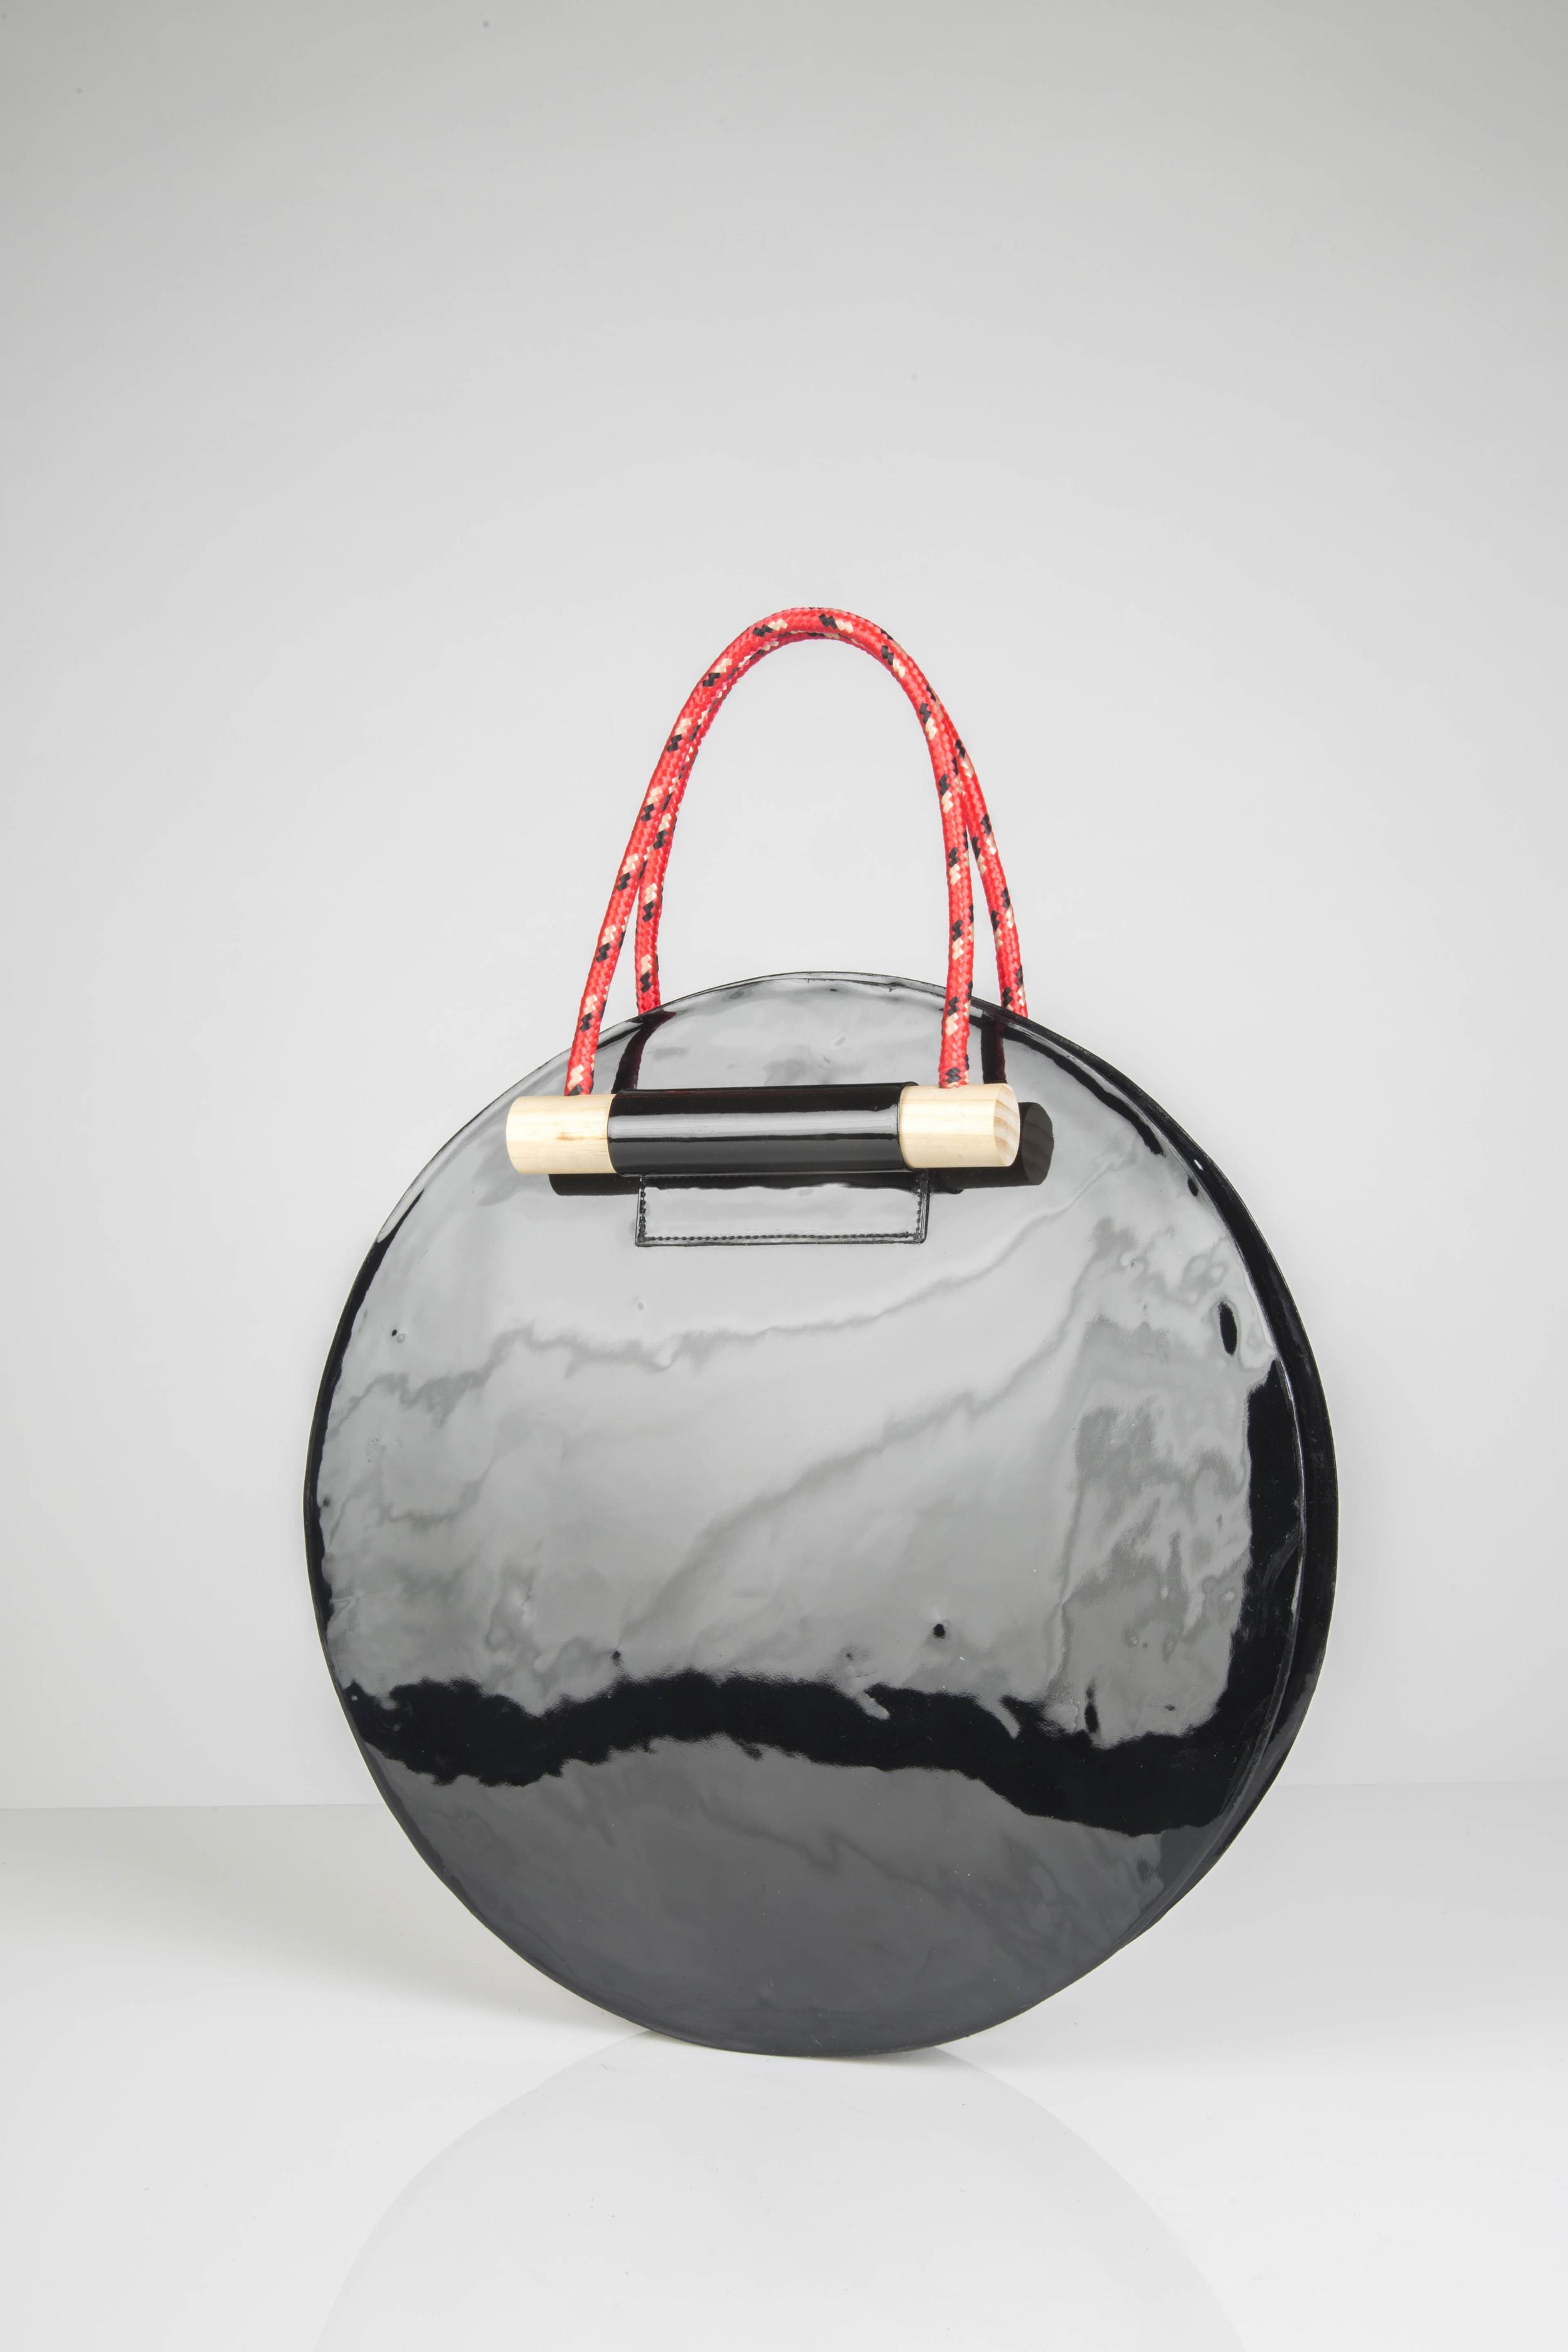 LITERALLYHandbags-11.jpg